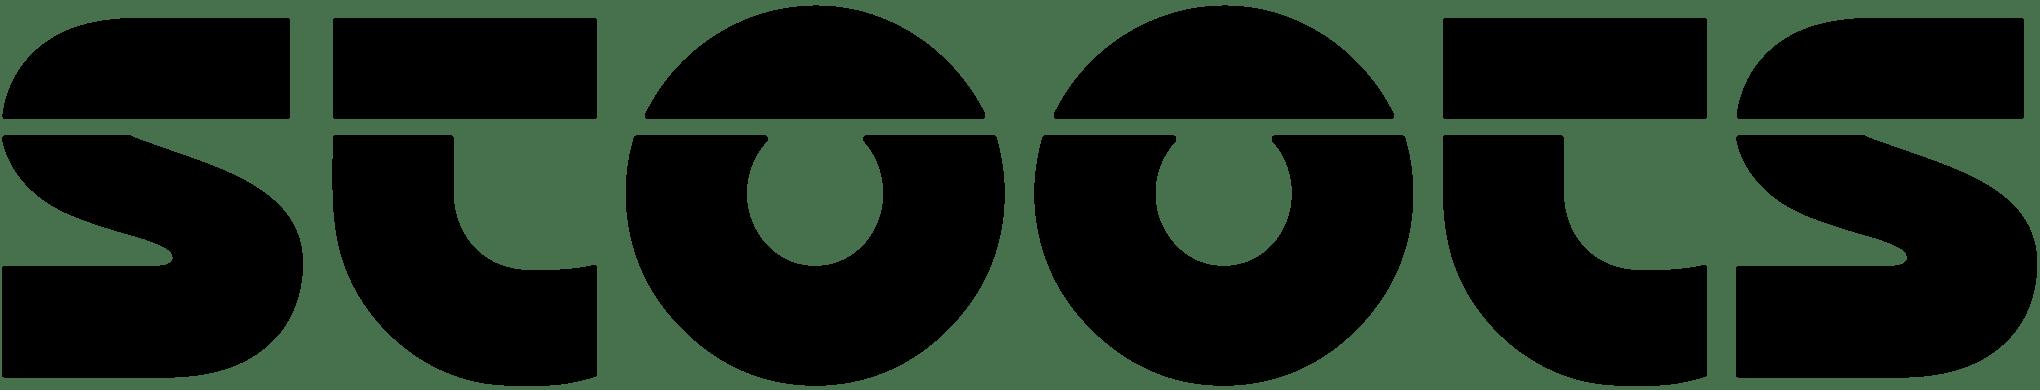 logo stoots lampes fontales